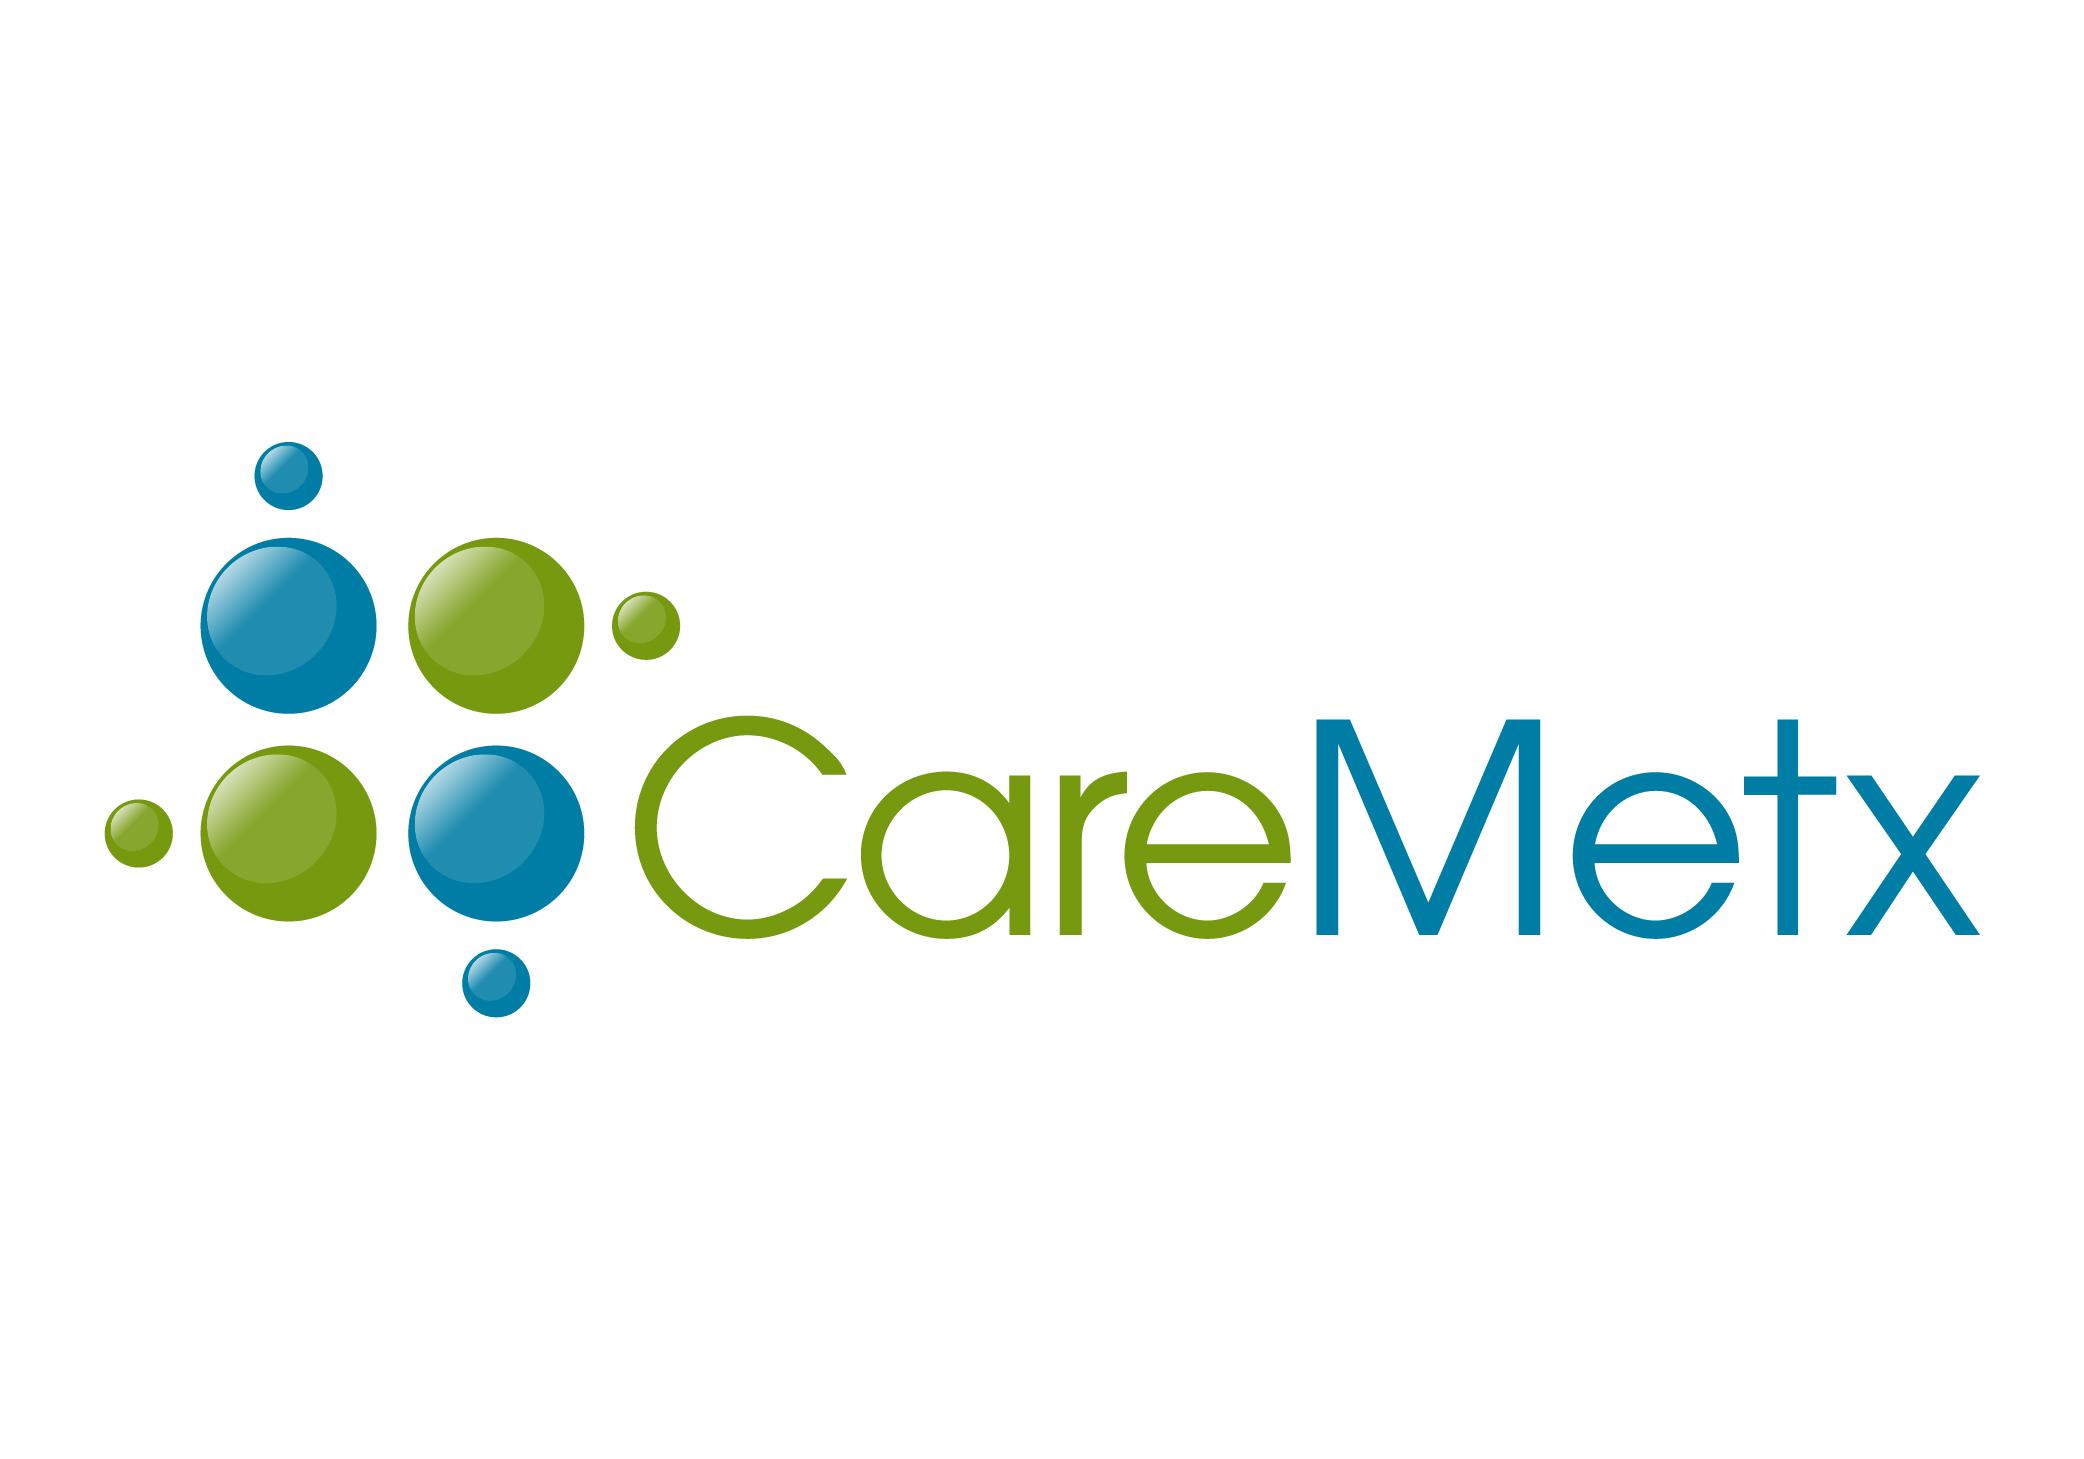 CareMetx